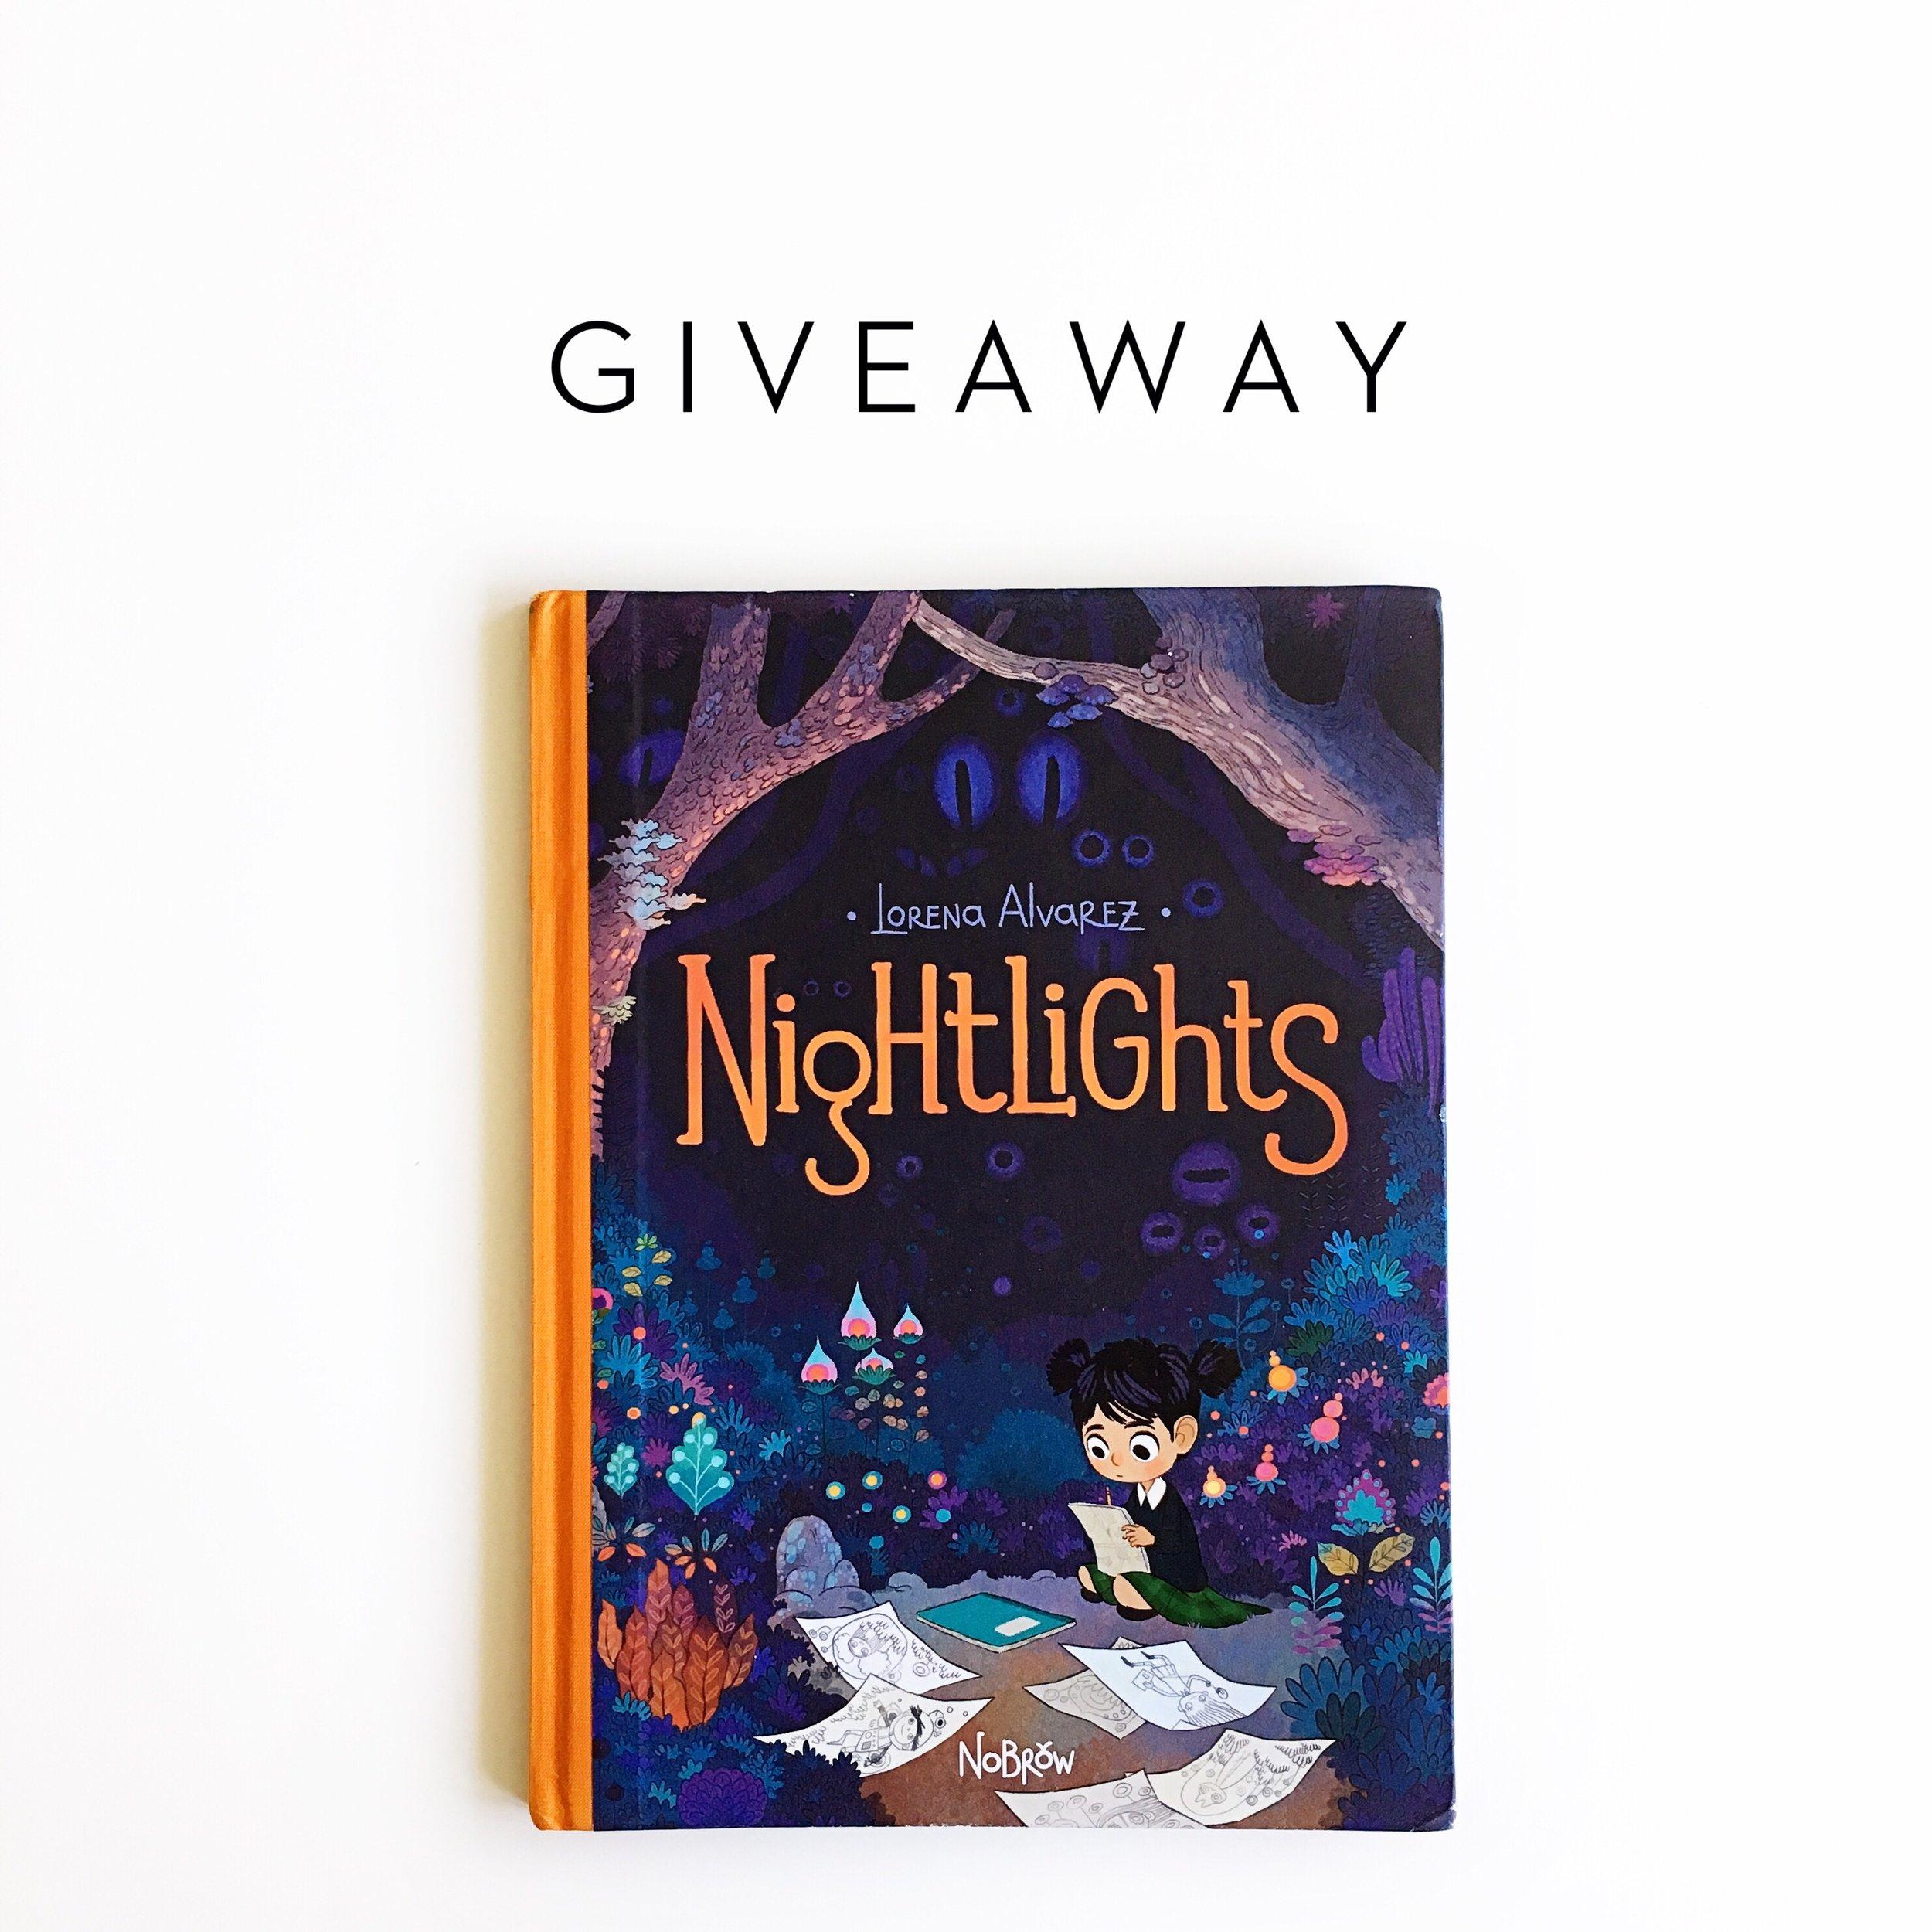 Nightlights + Giveaway | Little Lit Book Series